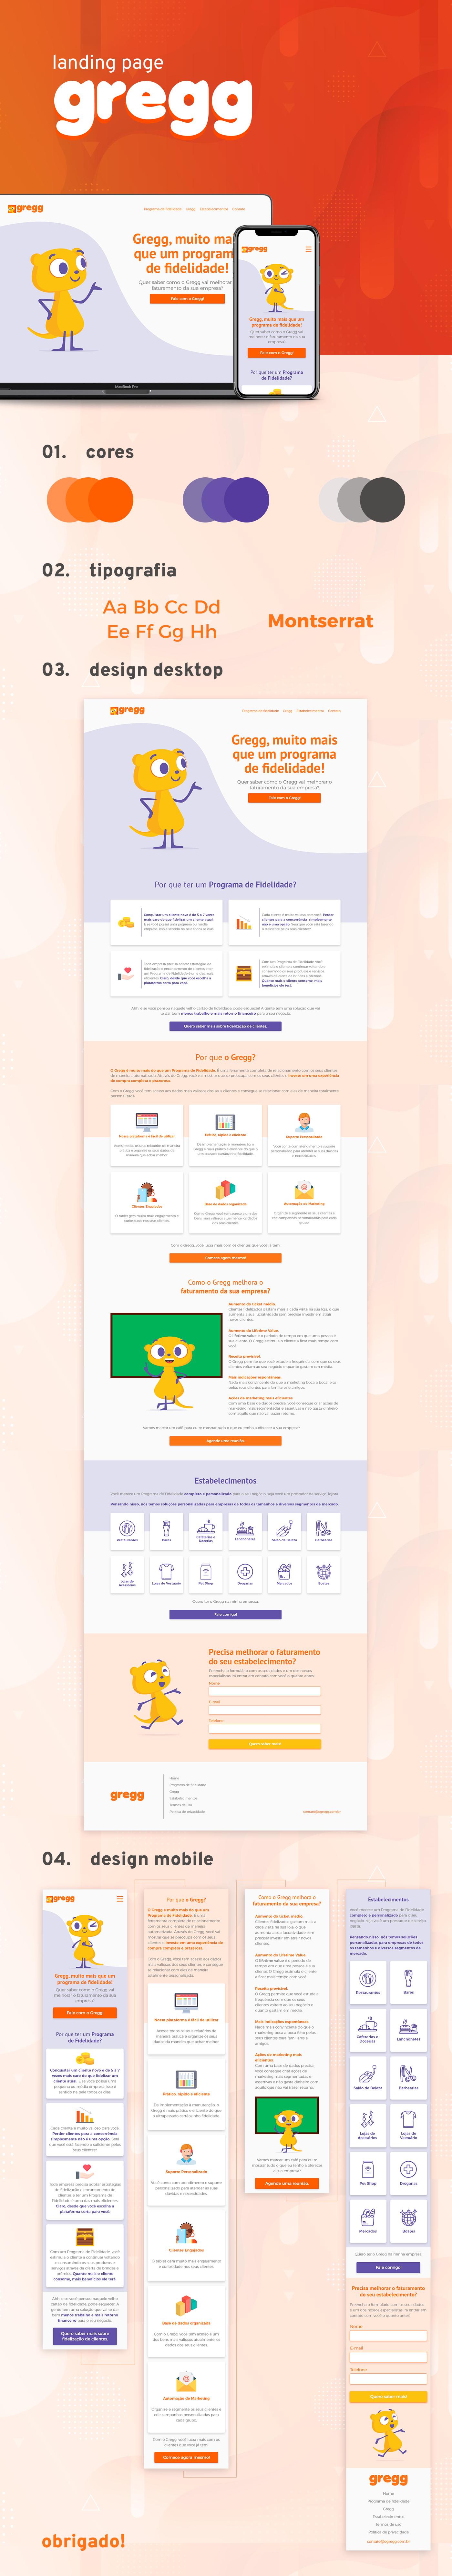 ui design,UX design,landing page,Adobe XD,site,Interface